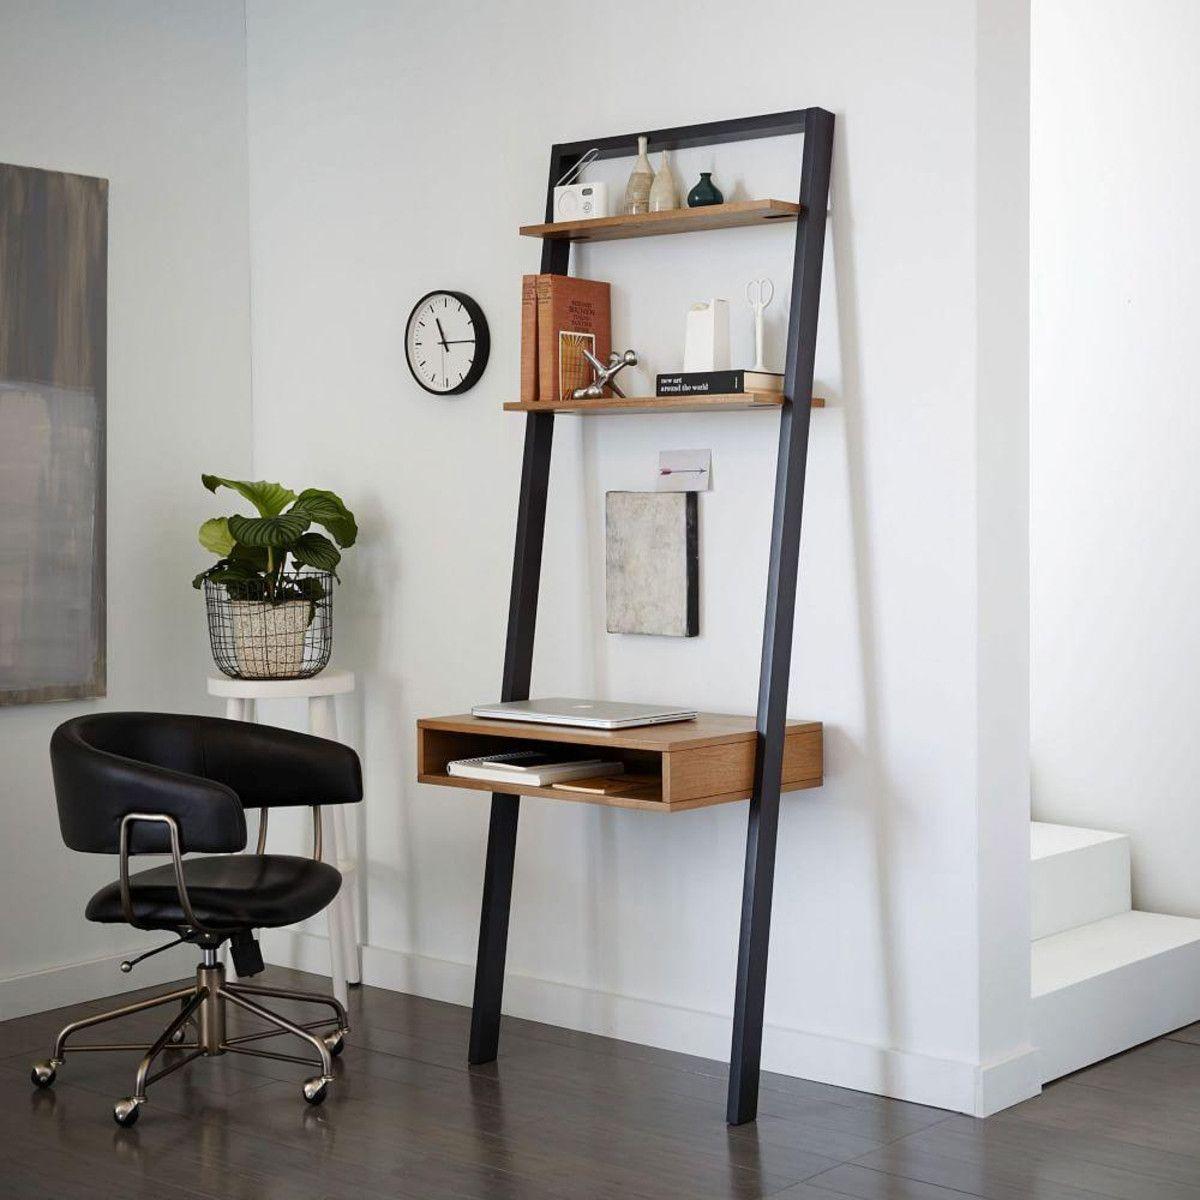 Ladder Shelf Storage Desk | Brennan Remodel Project | Pinterest ...